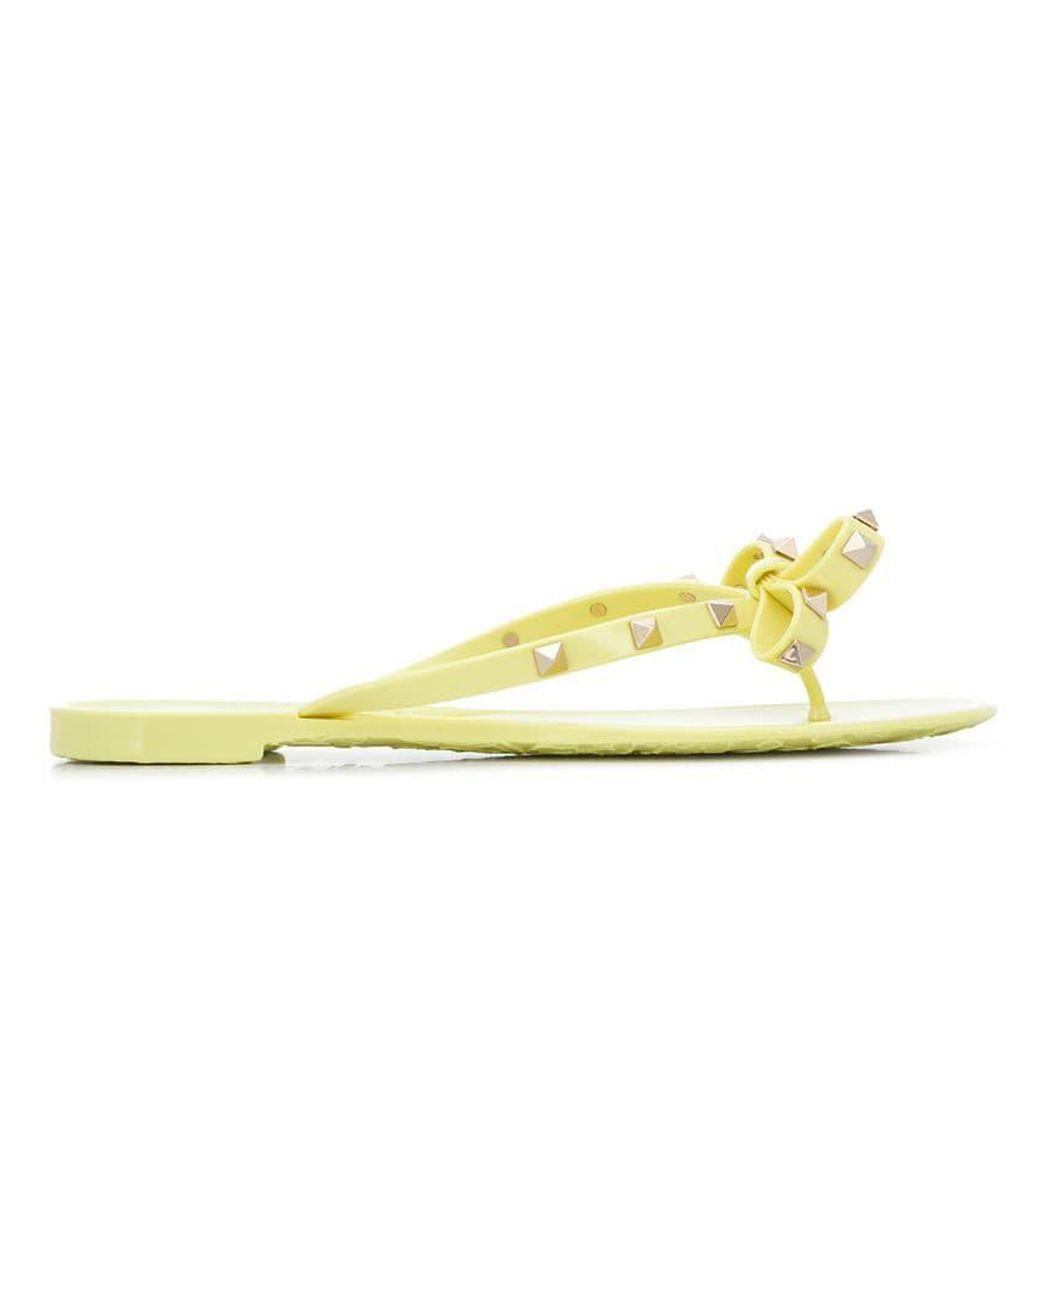 7c75d95858b2 Lyst - Valentino Garavani Rockstud Bow Flip Flops in Yellow